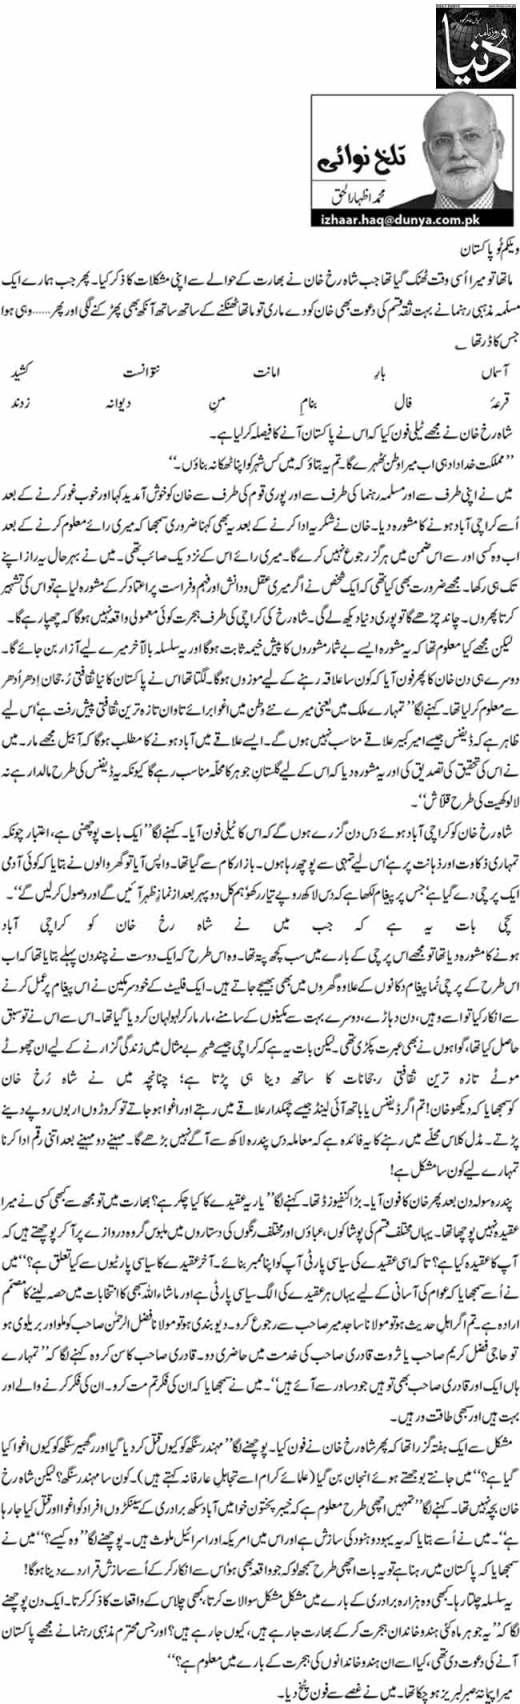 Welcome to Pakistan - M. Izhar ul Haq